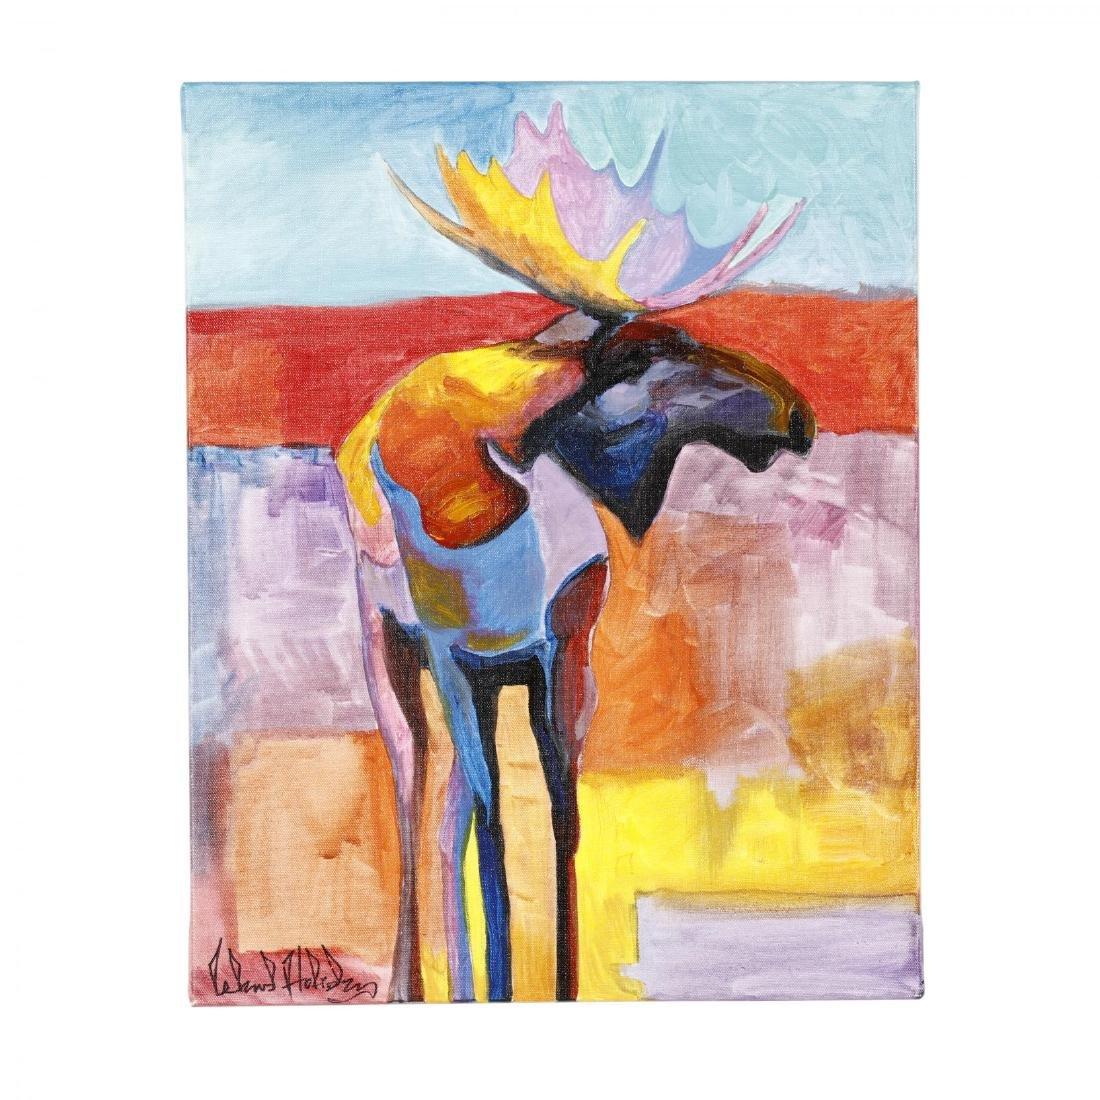 Navajo Folk Painting of a Moose by Leland Holiday